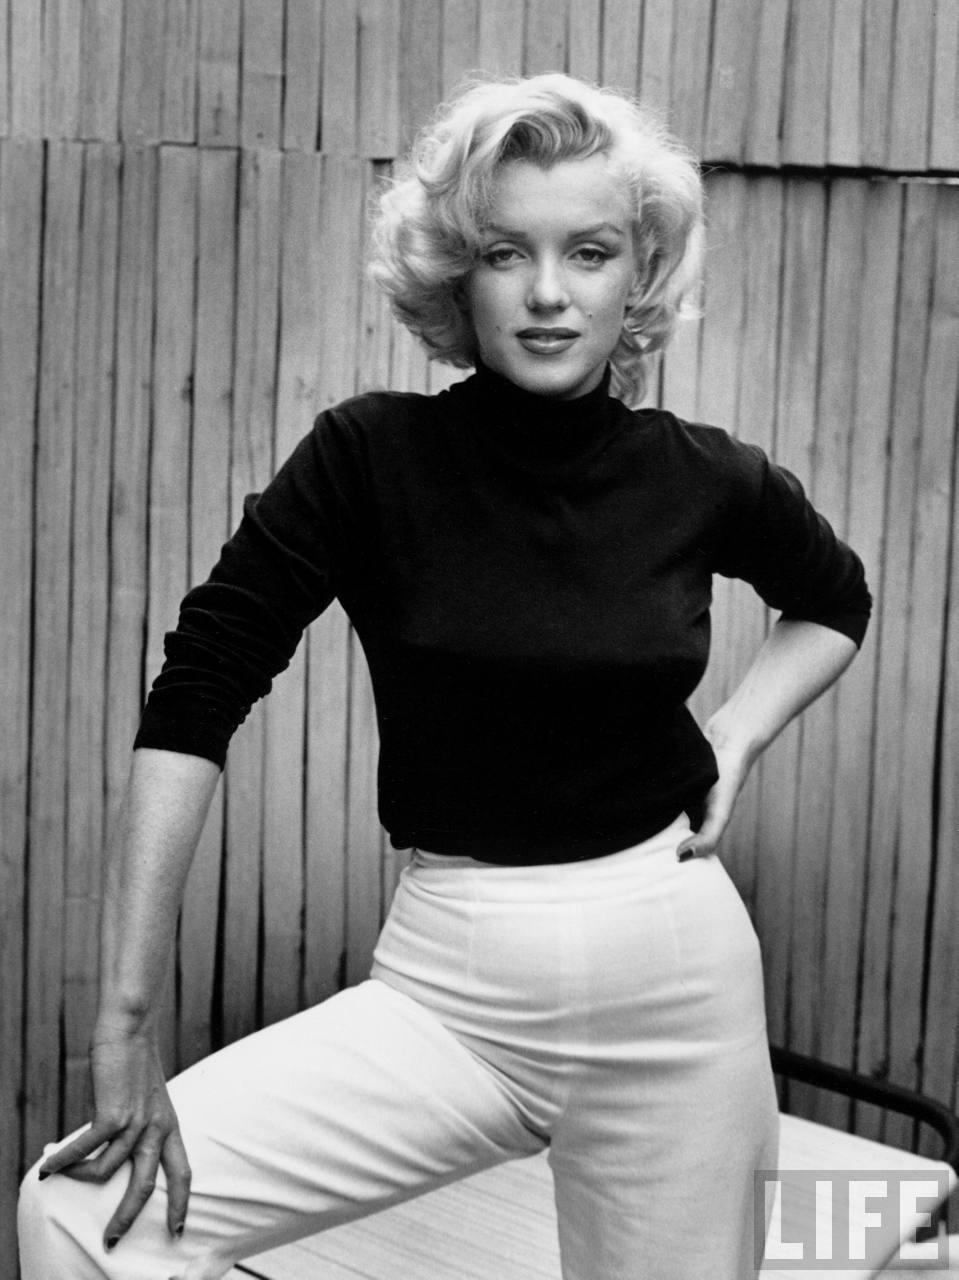 Marilyn Monroe Images Marilyn Monroe Hd Wallpaper And